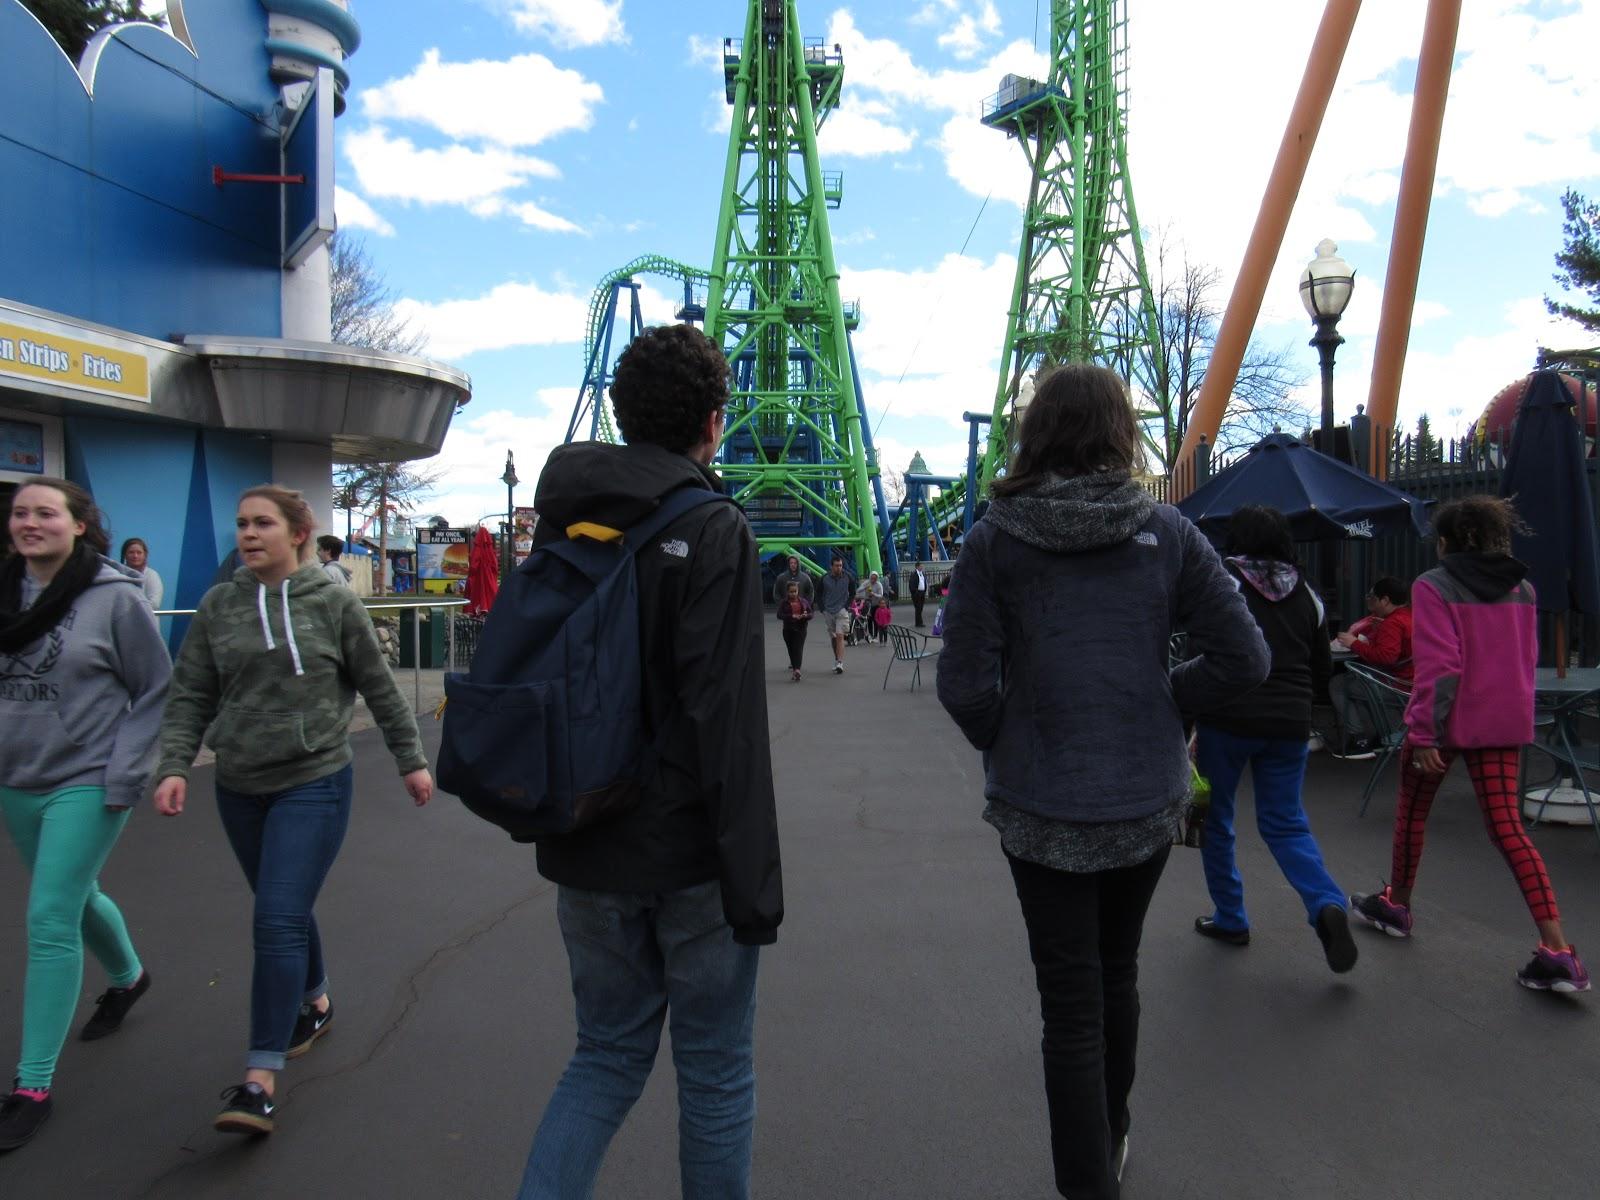 Amusement Park News | Wicked Coasters